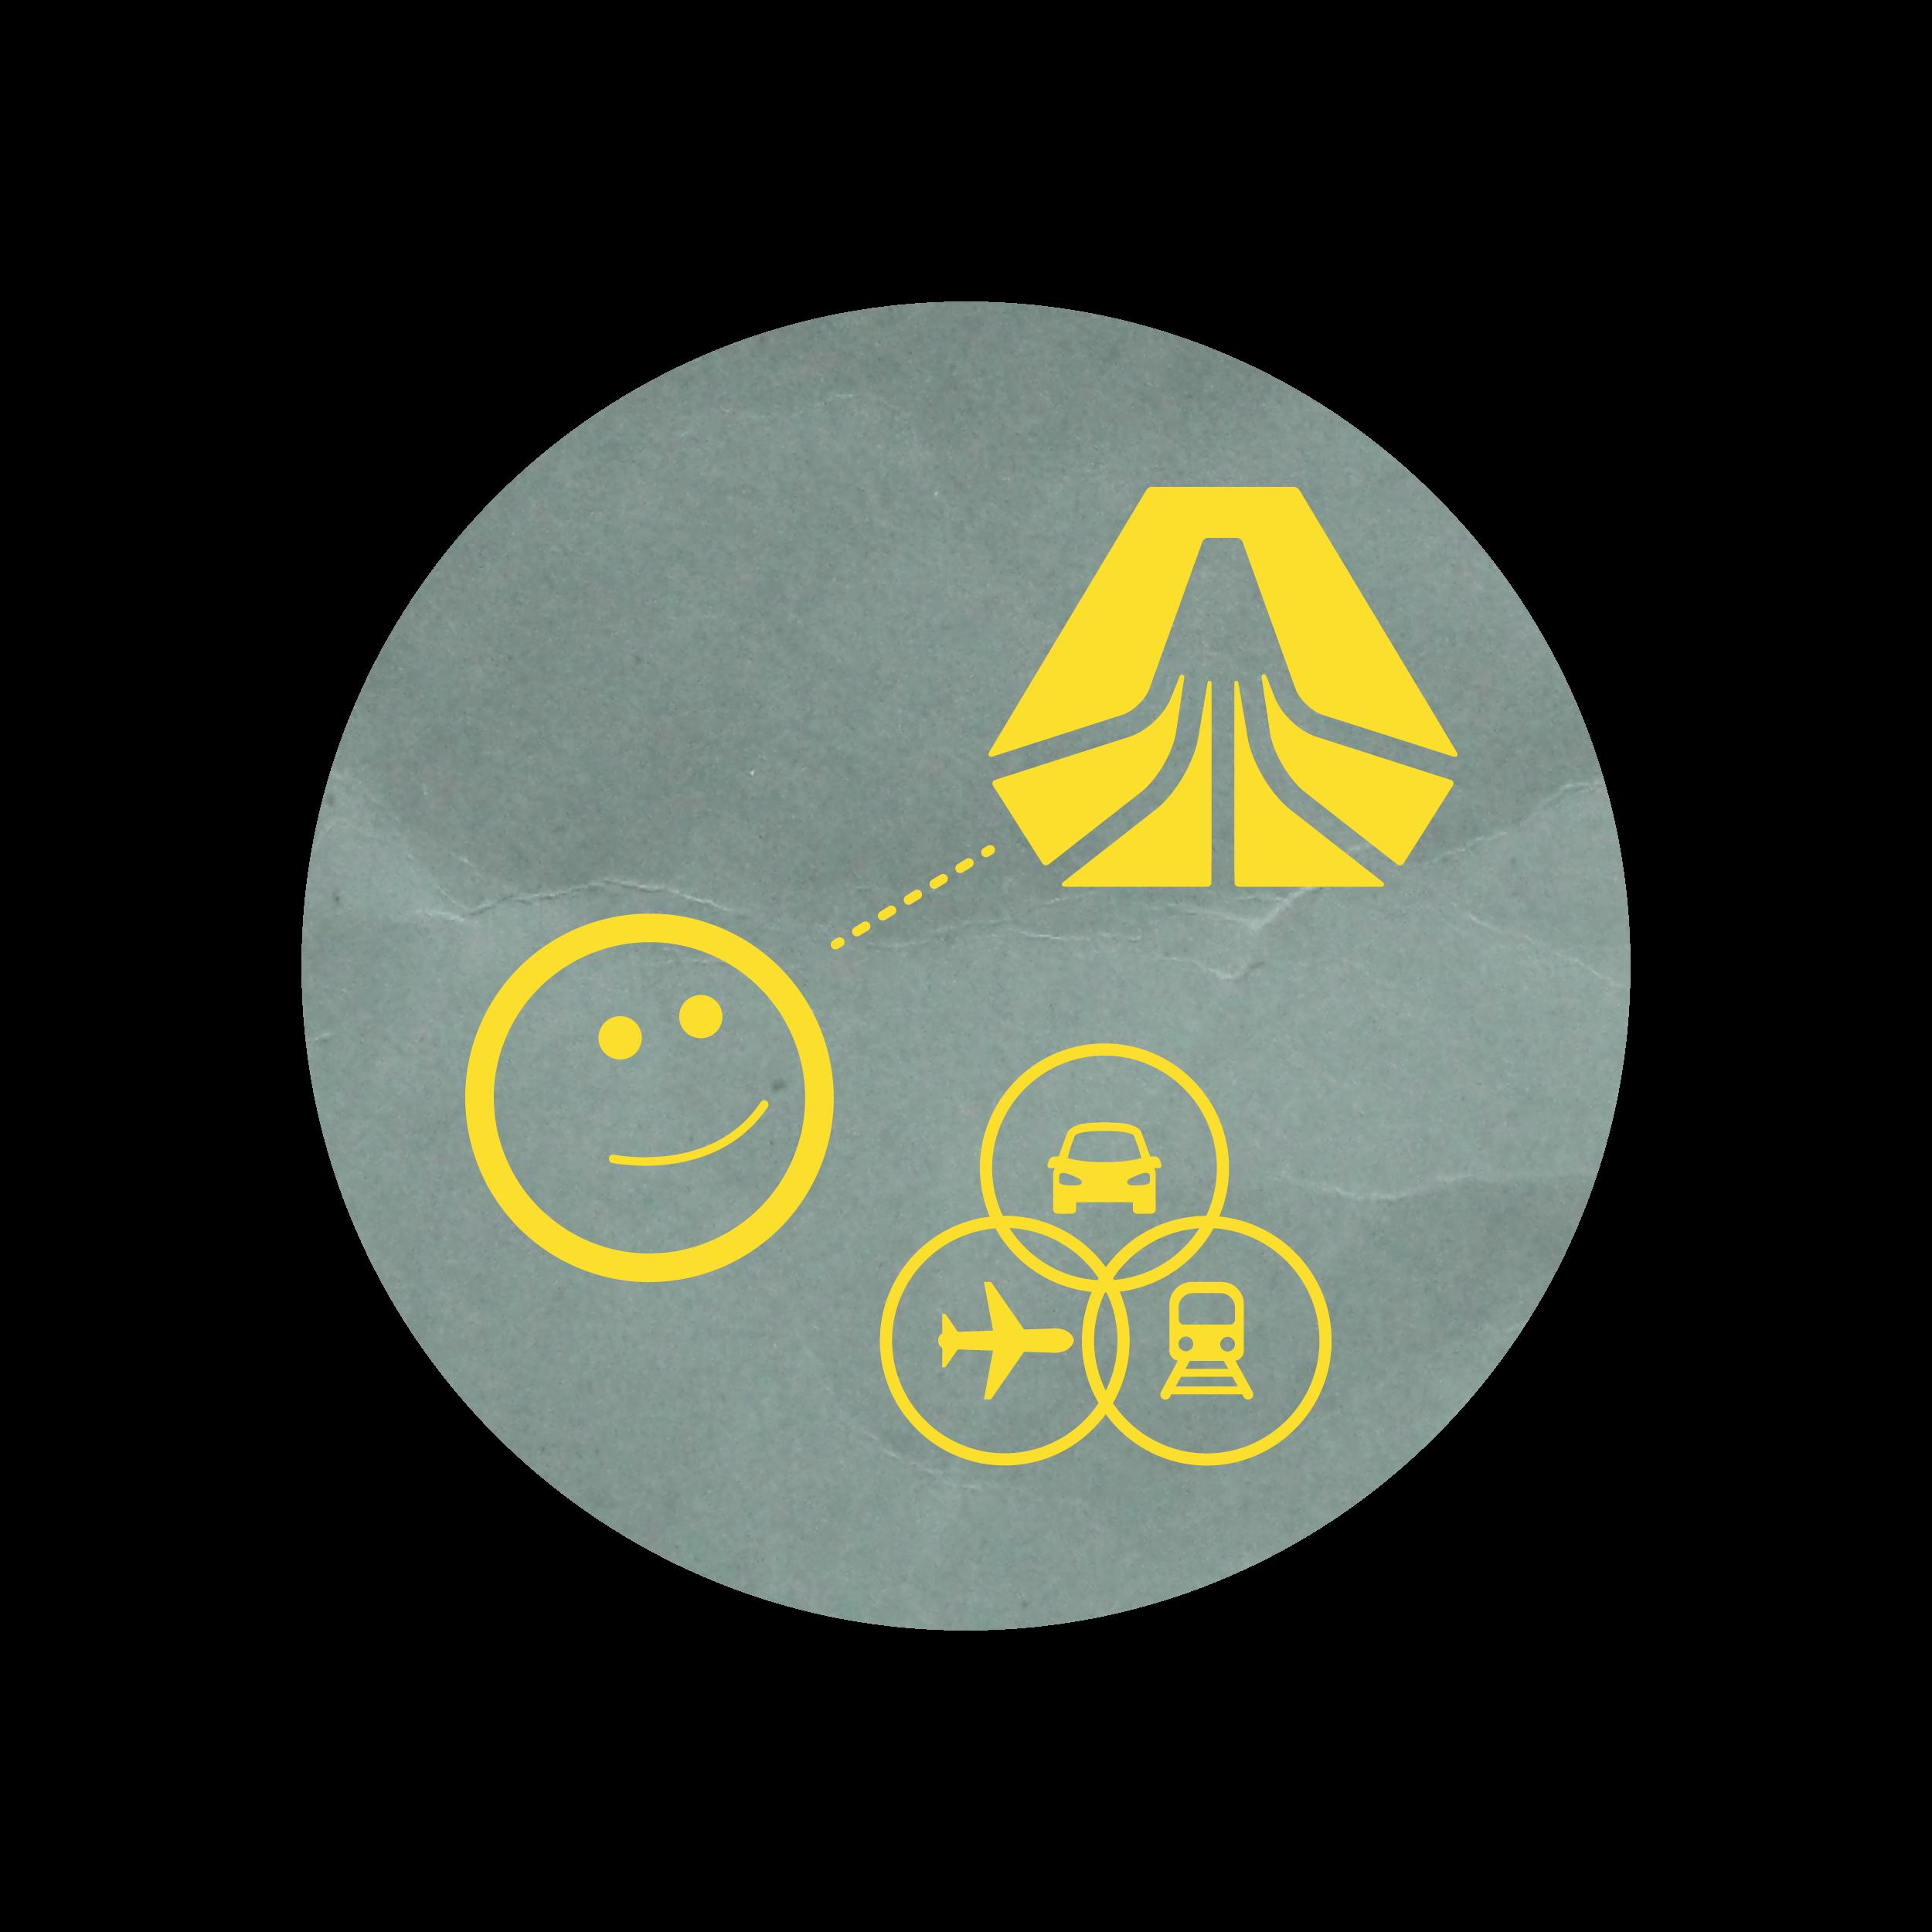 Skookum logo and transport - 2